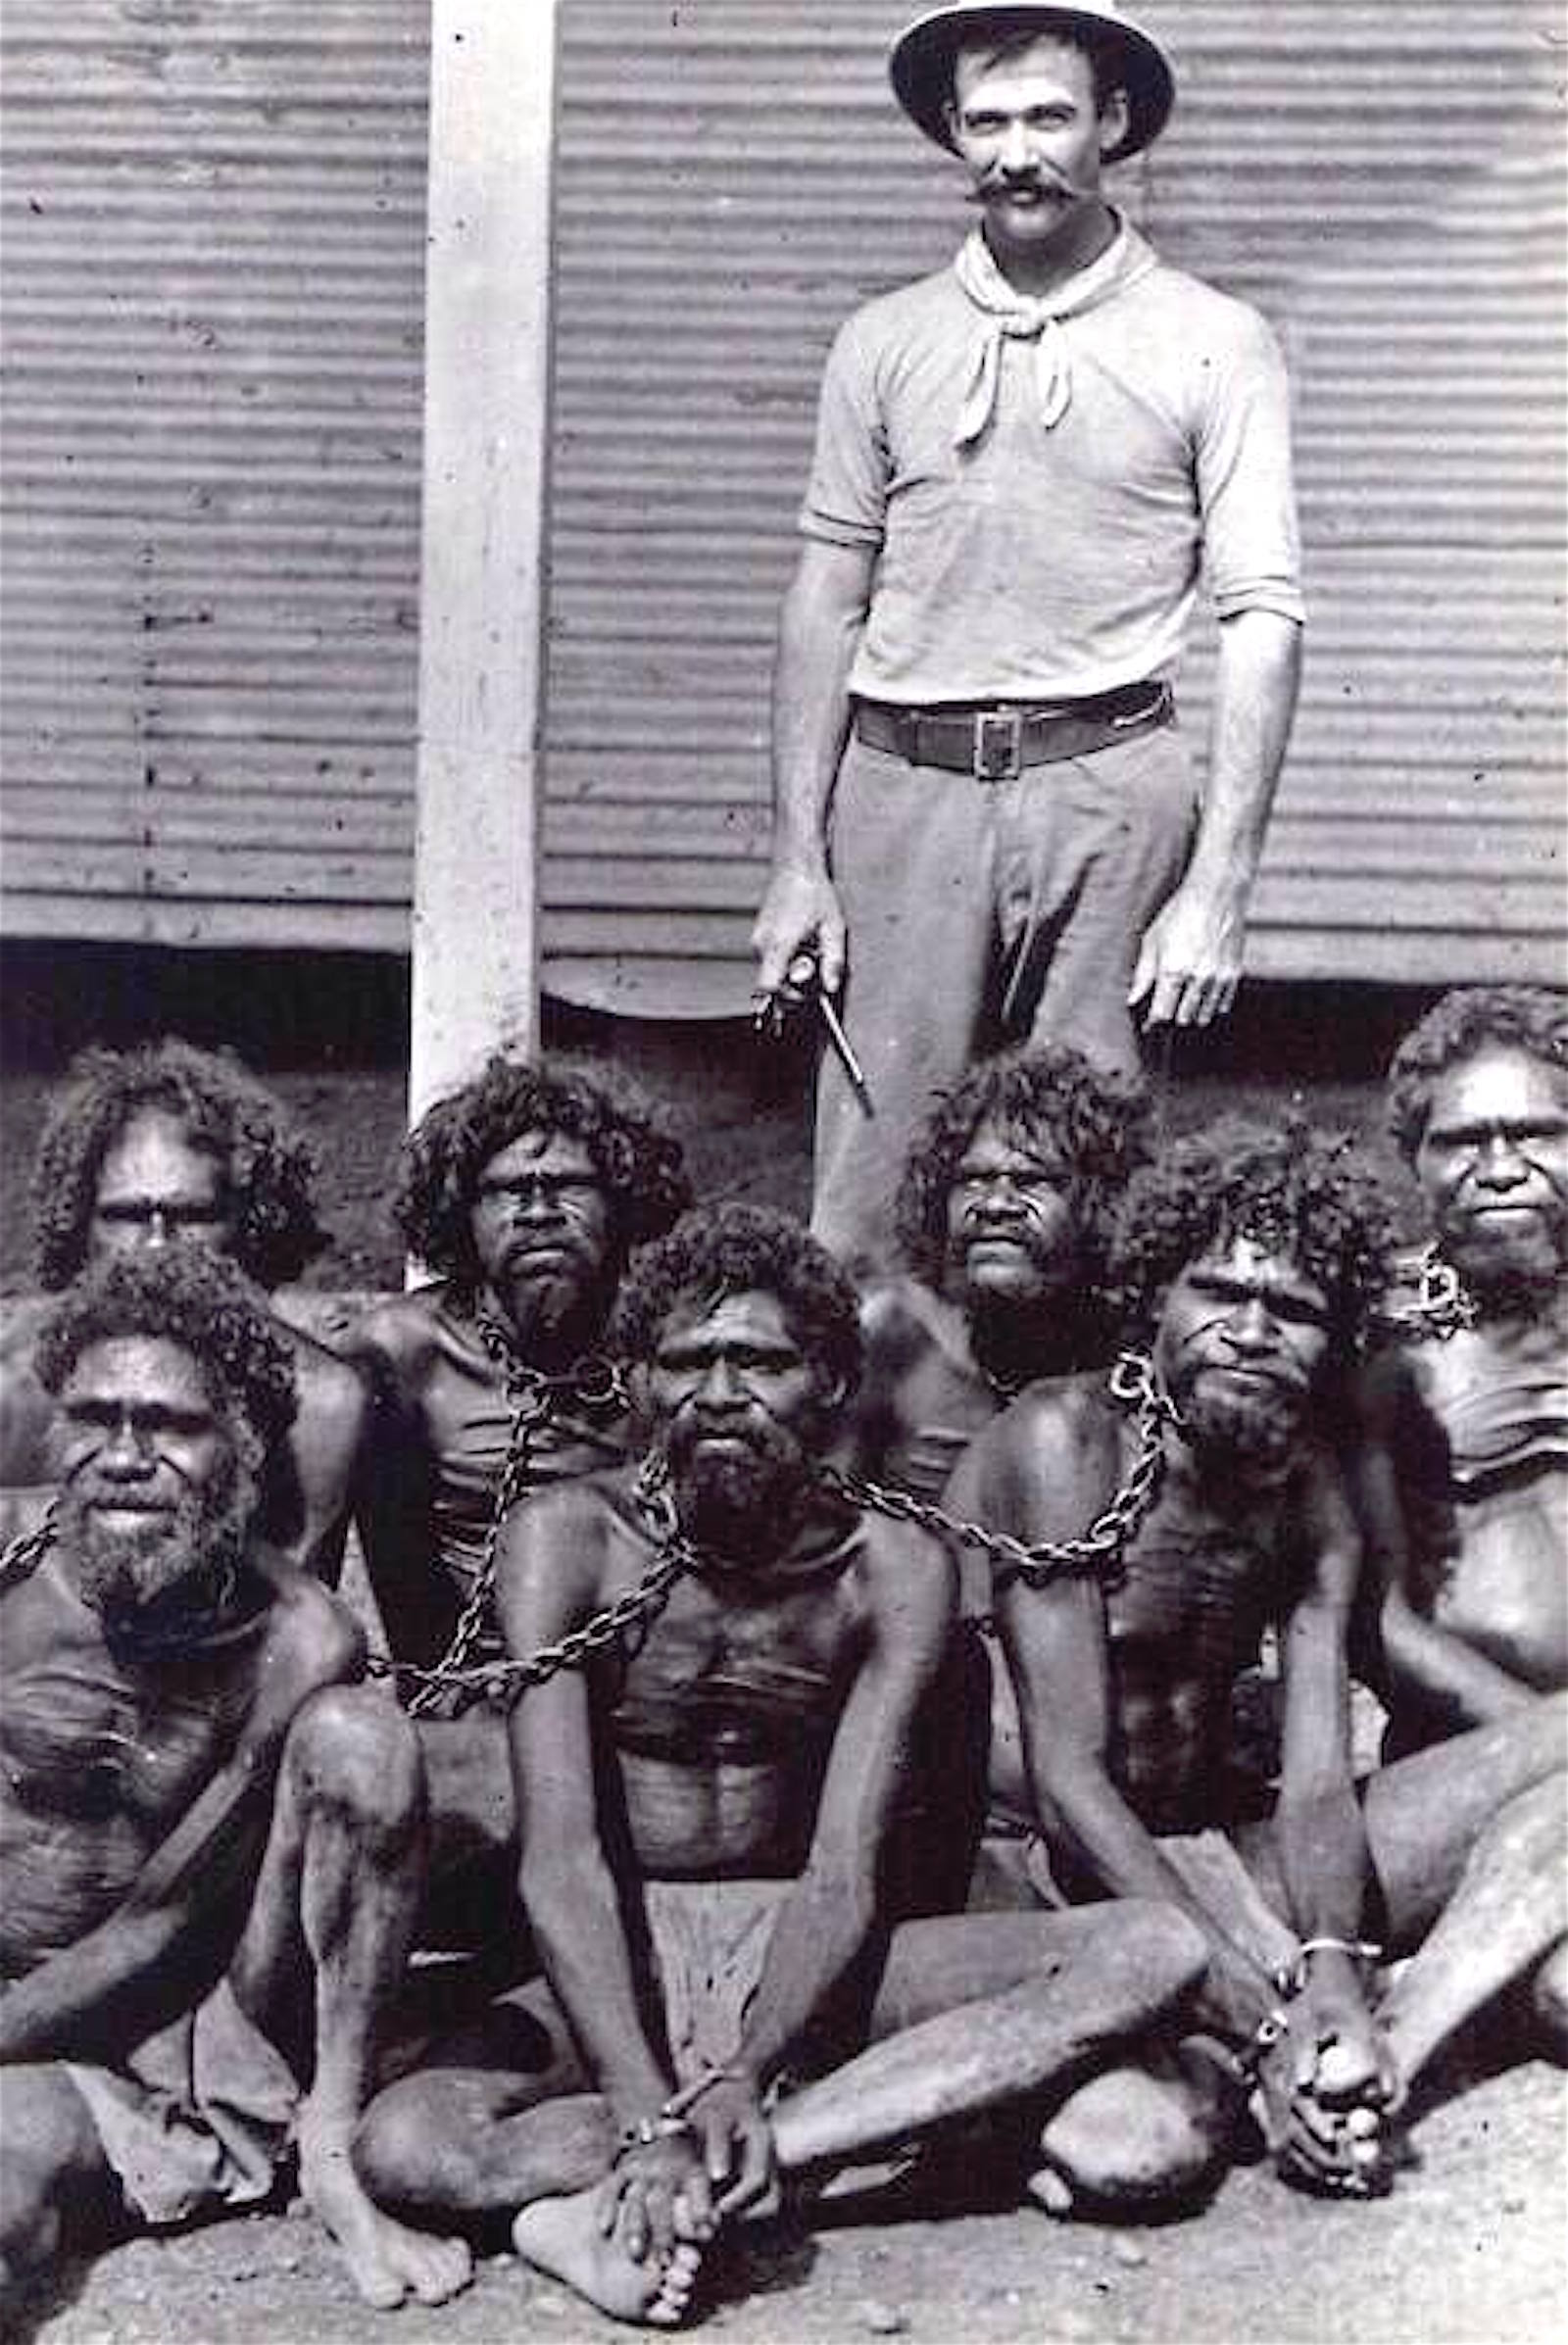 Aboriginal slaves, Australia, 1900